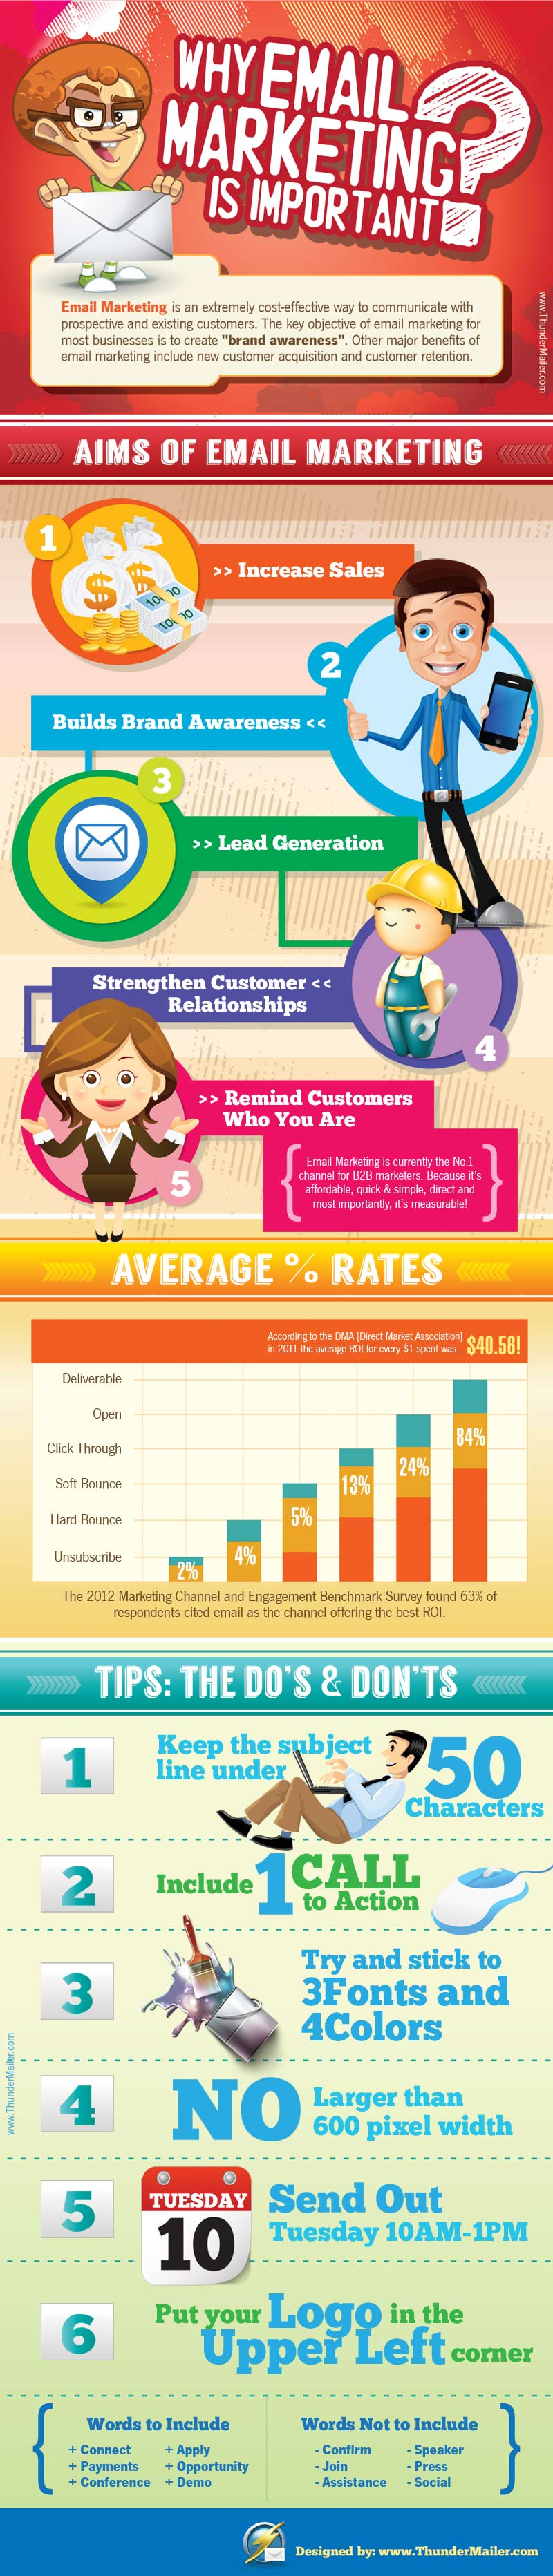 Perché l'email marketing è importante